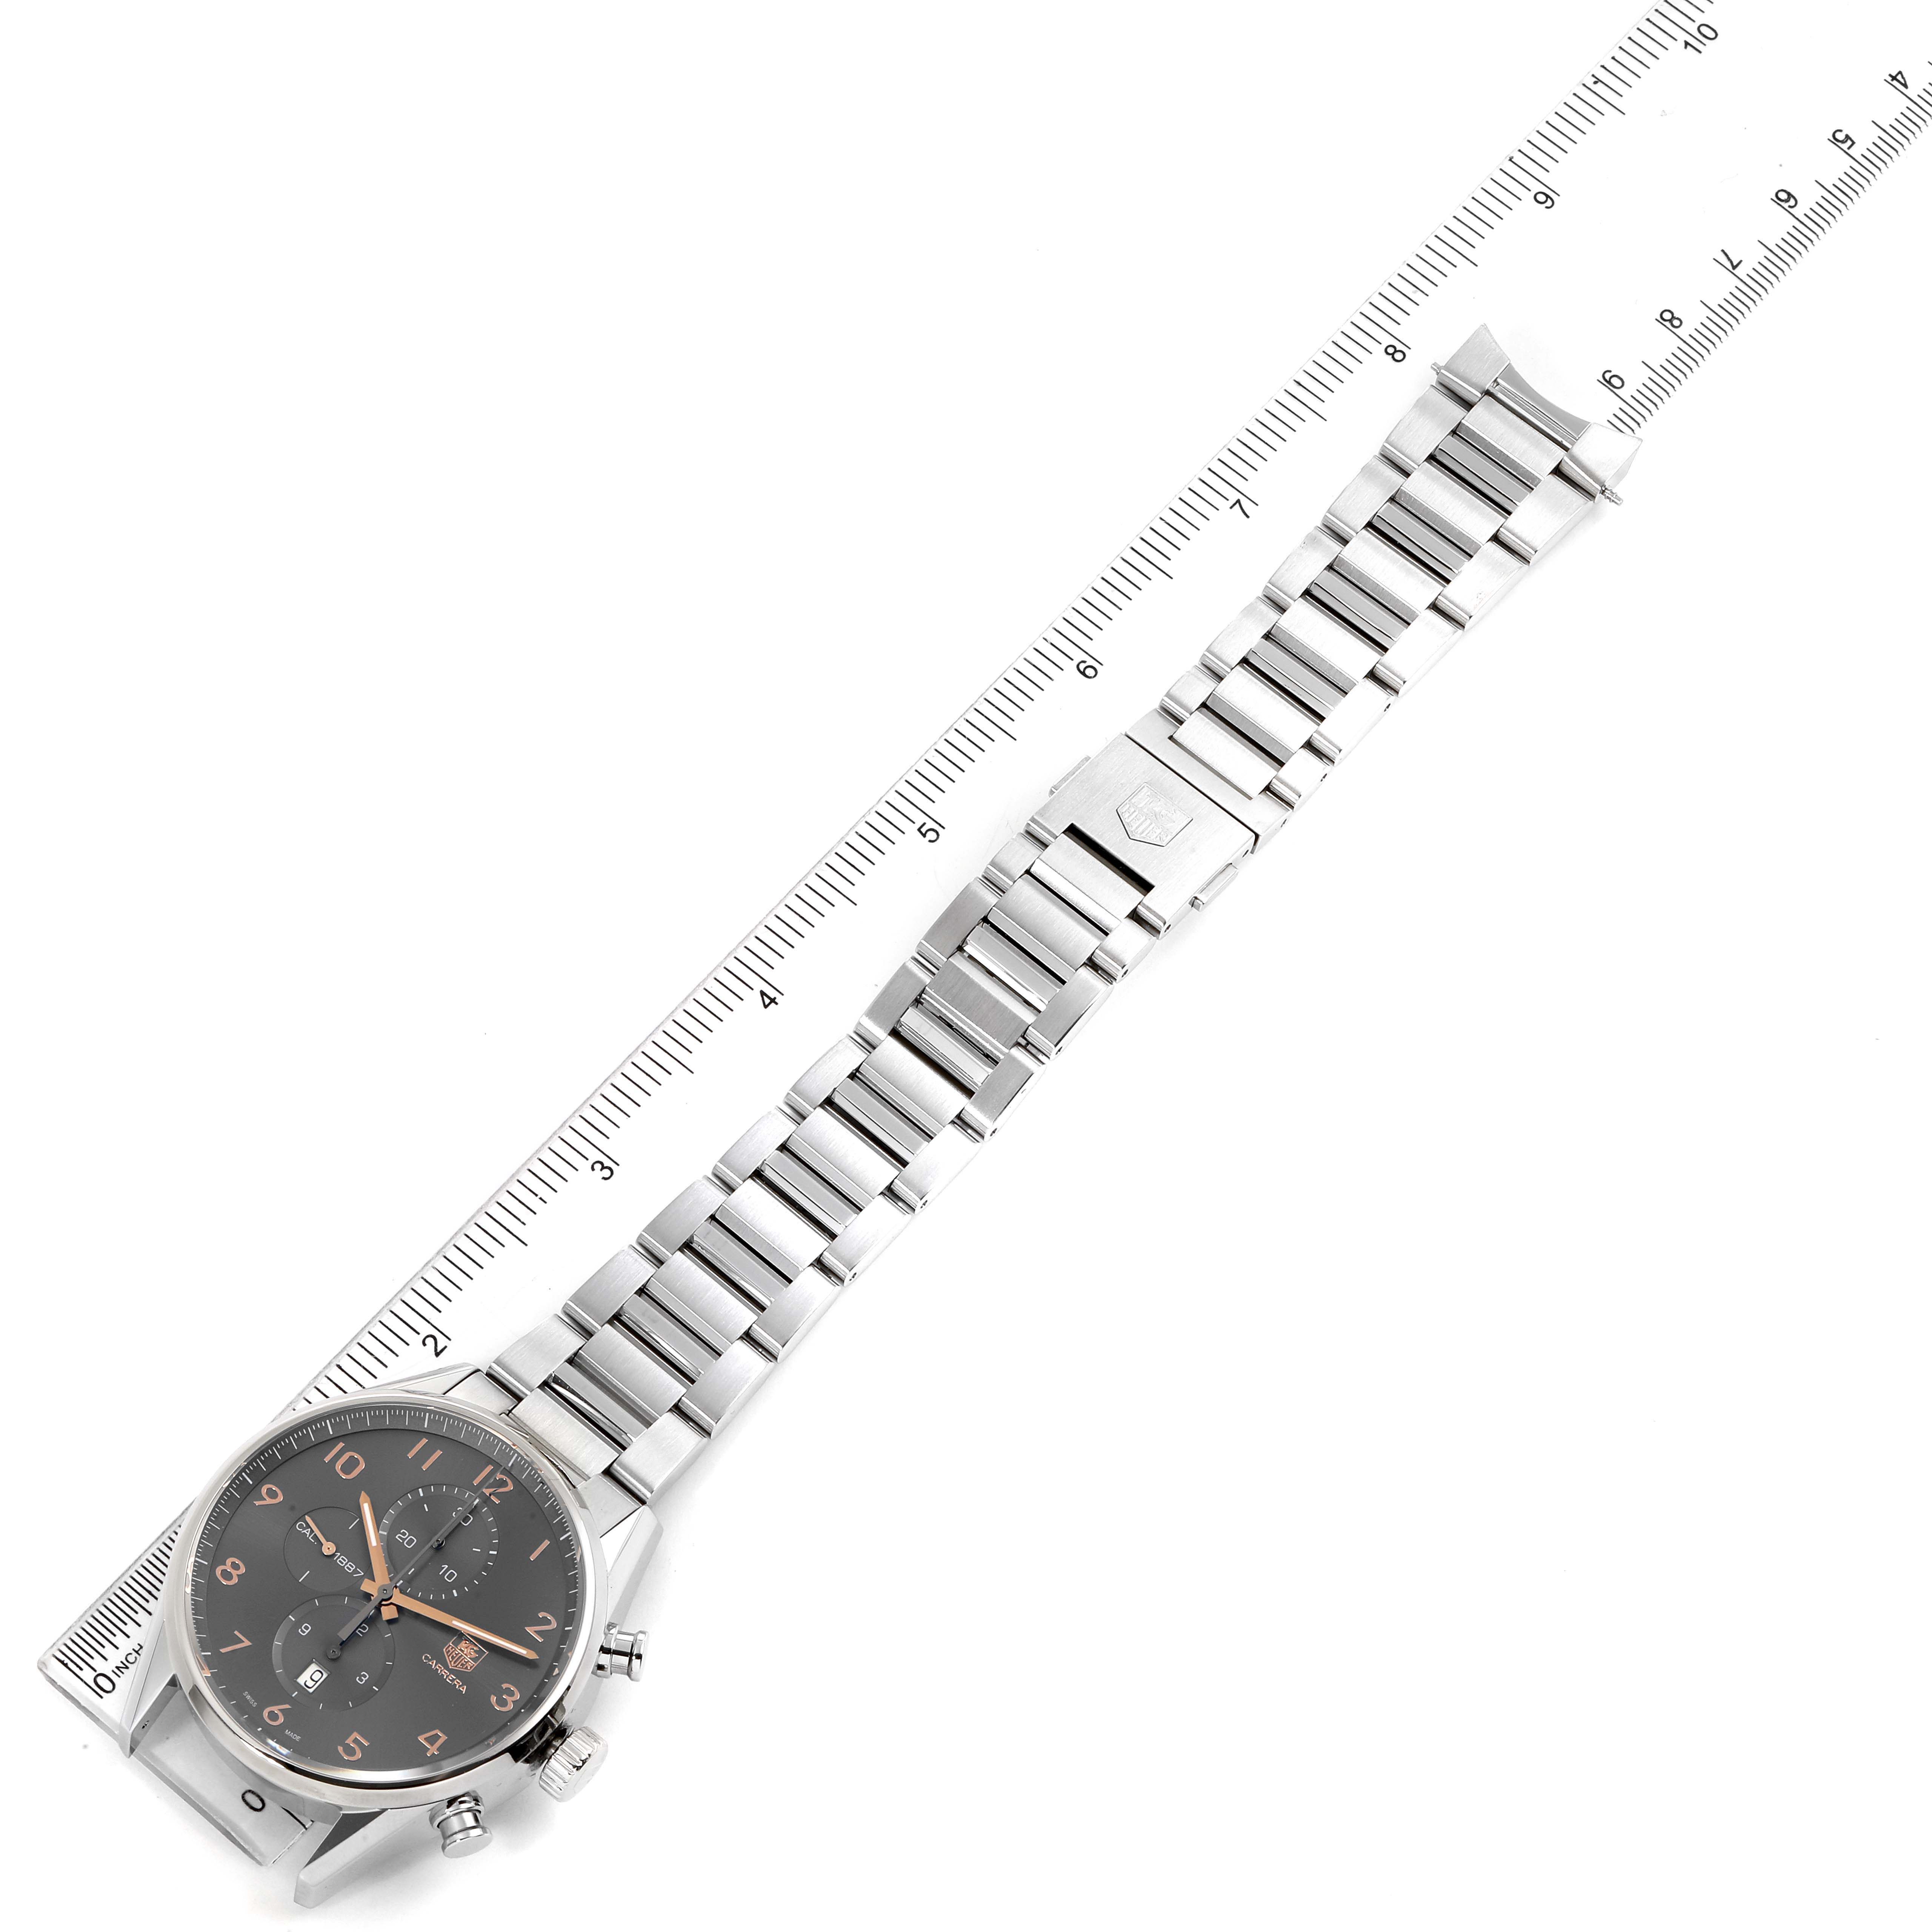 Tag Heuer Carrera 1887 Grey Dial Chronograph Mens Watch CAR2013 SwissWatchExpo